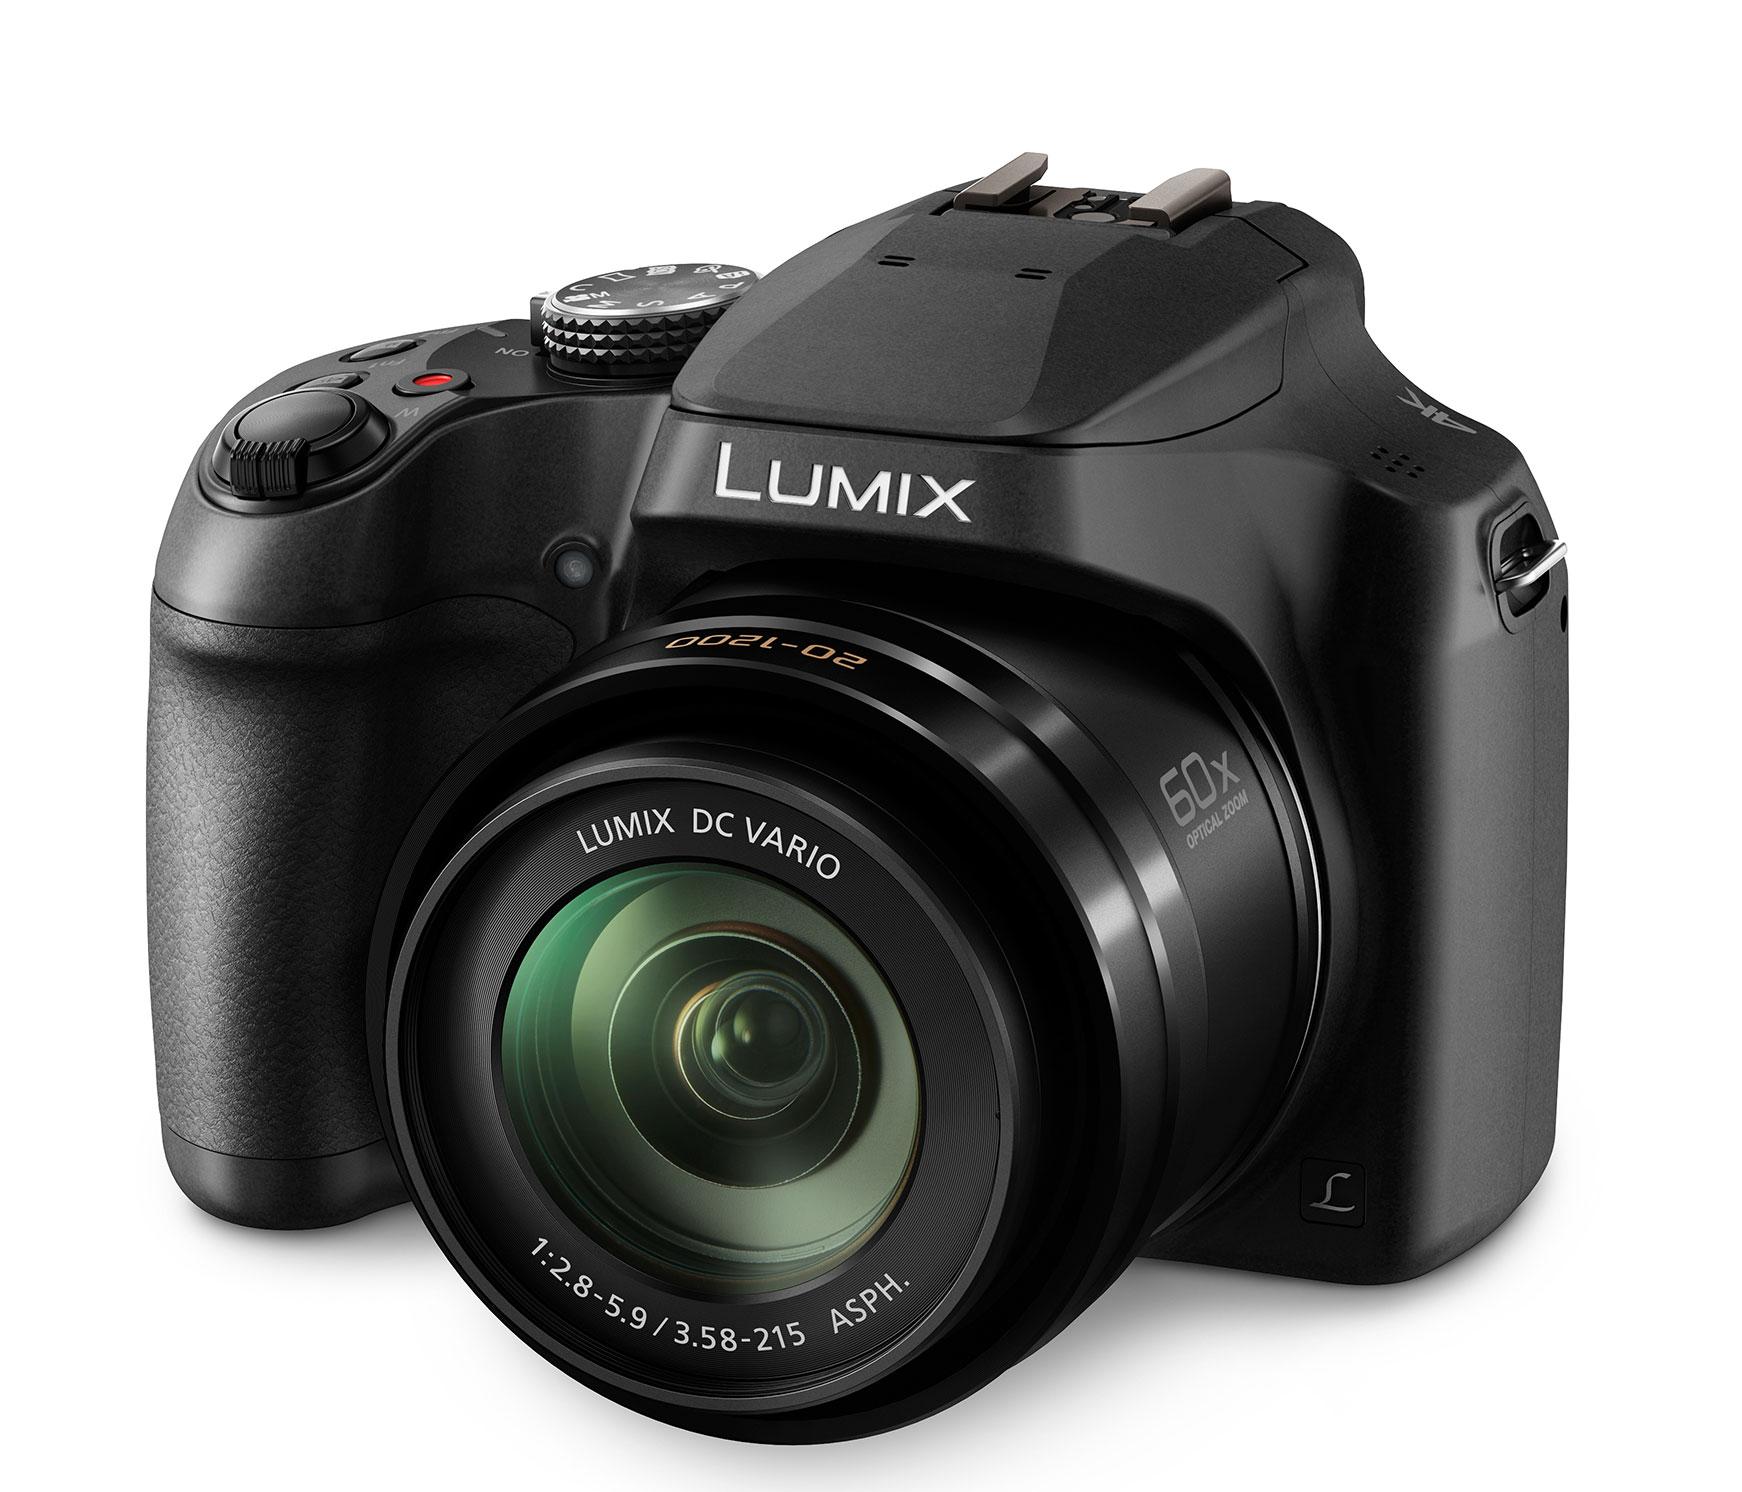 Panasonic Lumix FZ82 4K bridge camera for 349 euros // CES 2017